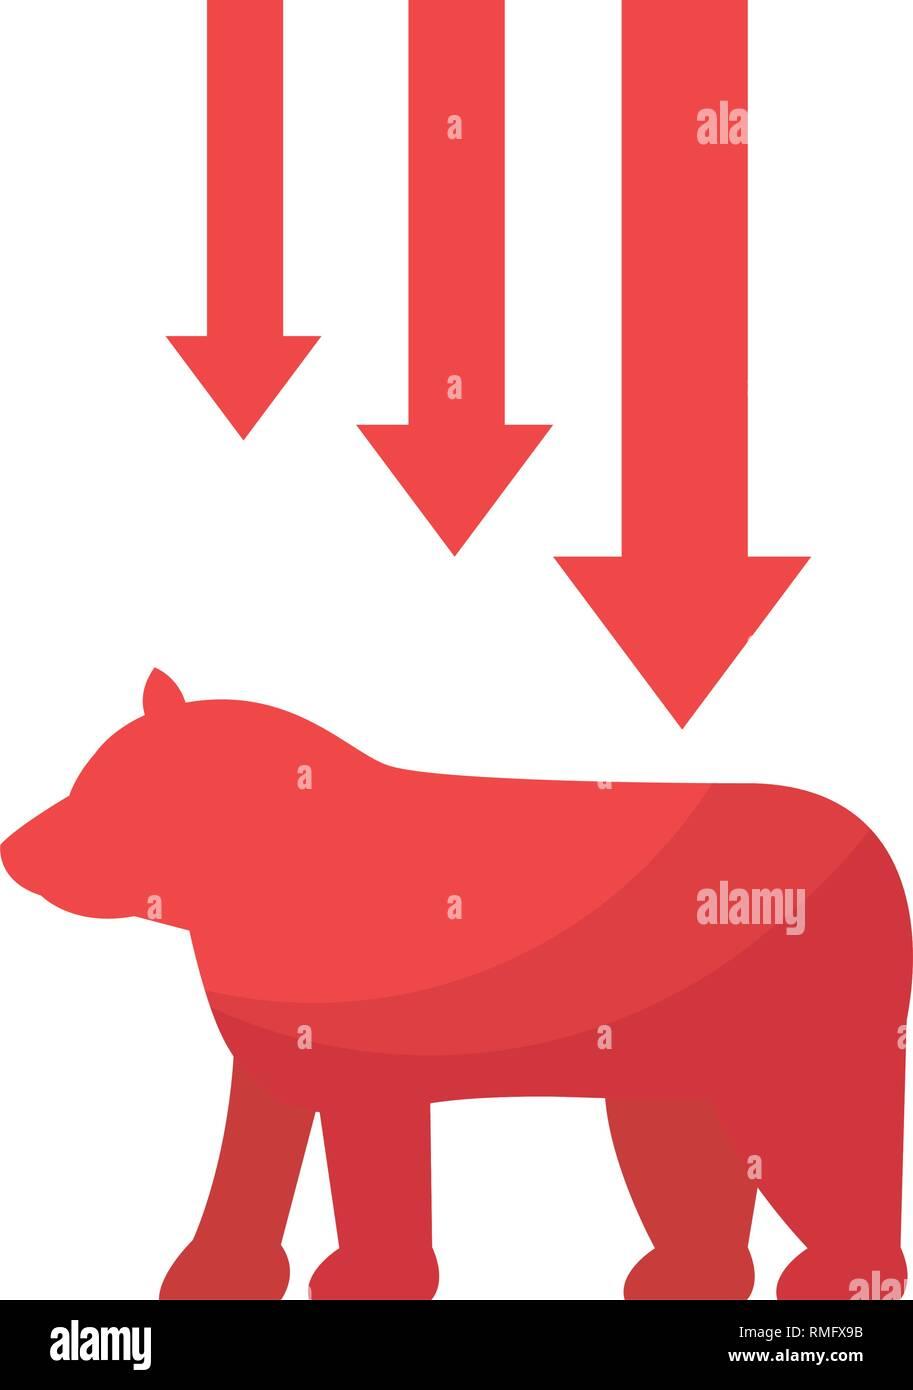 bear downtrend stock market symbol Stock Vector